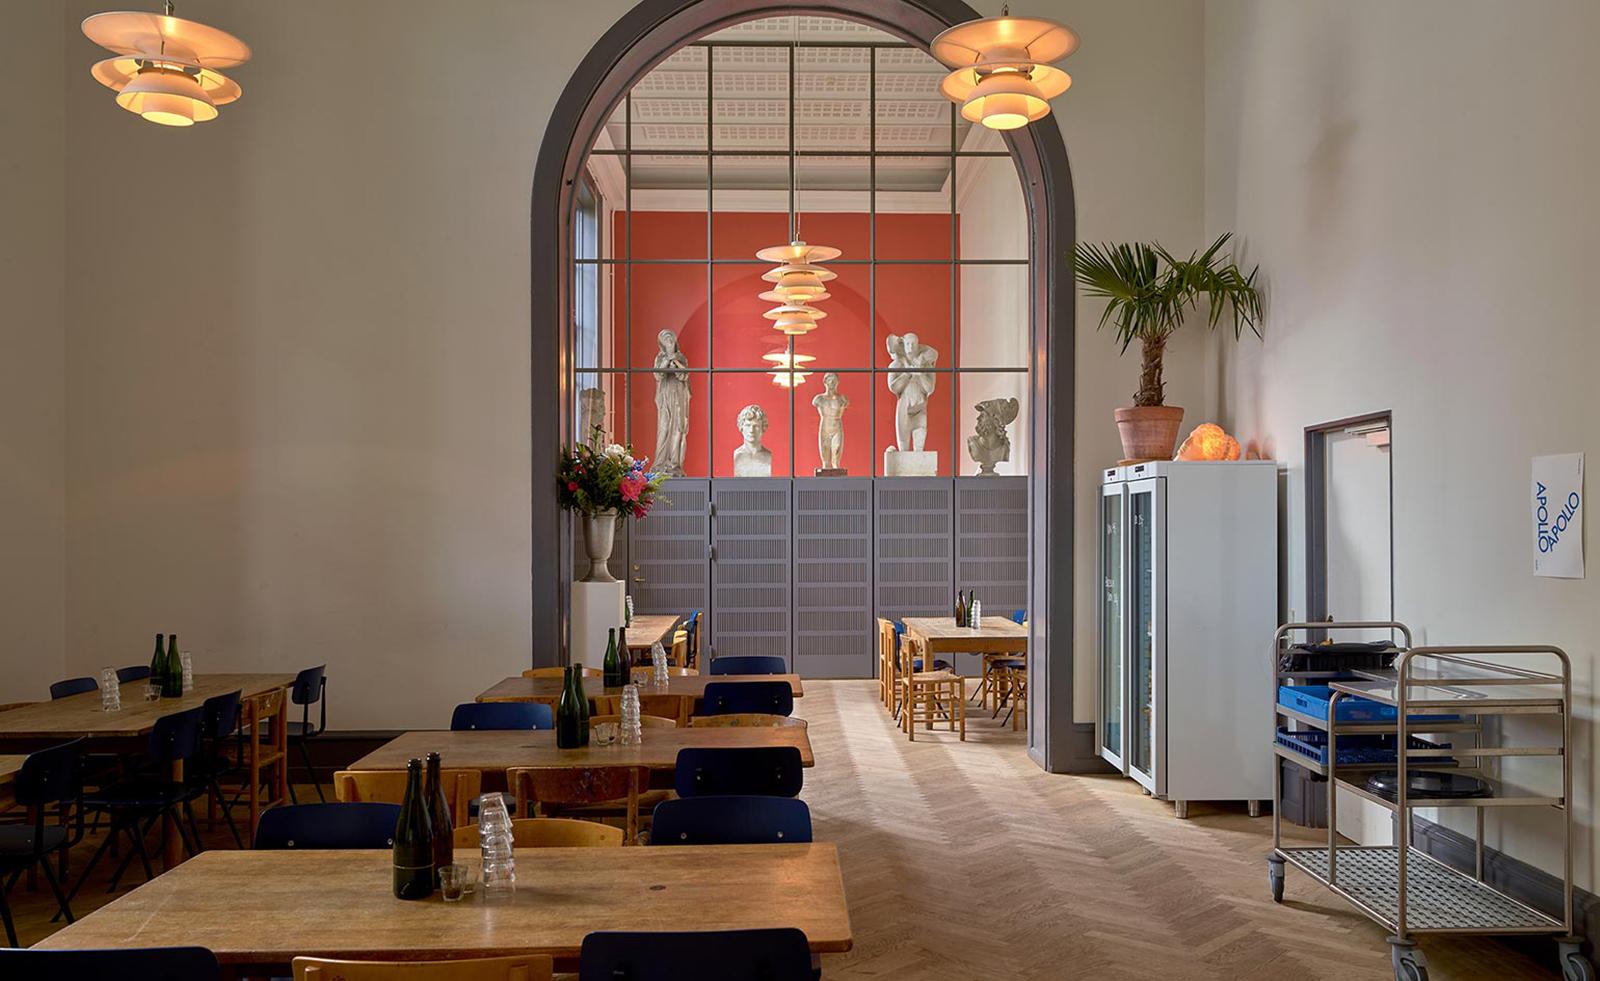 Apollo bar and restaurant